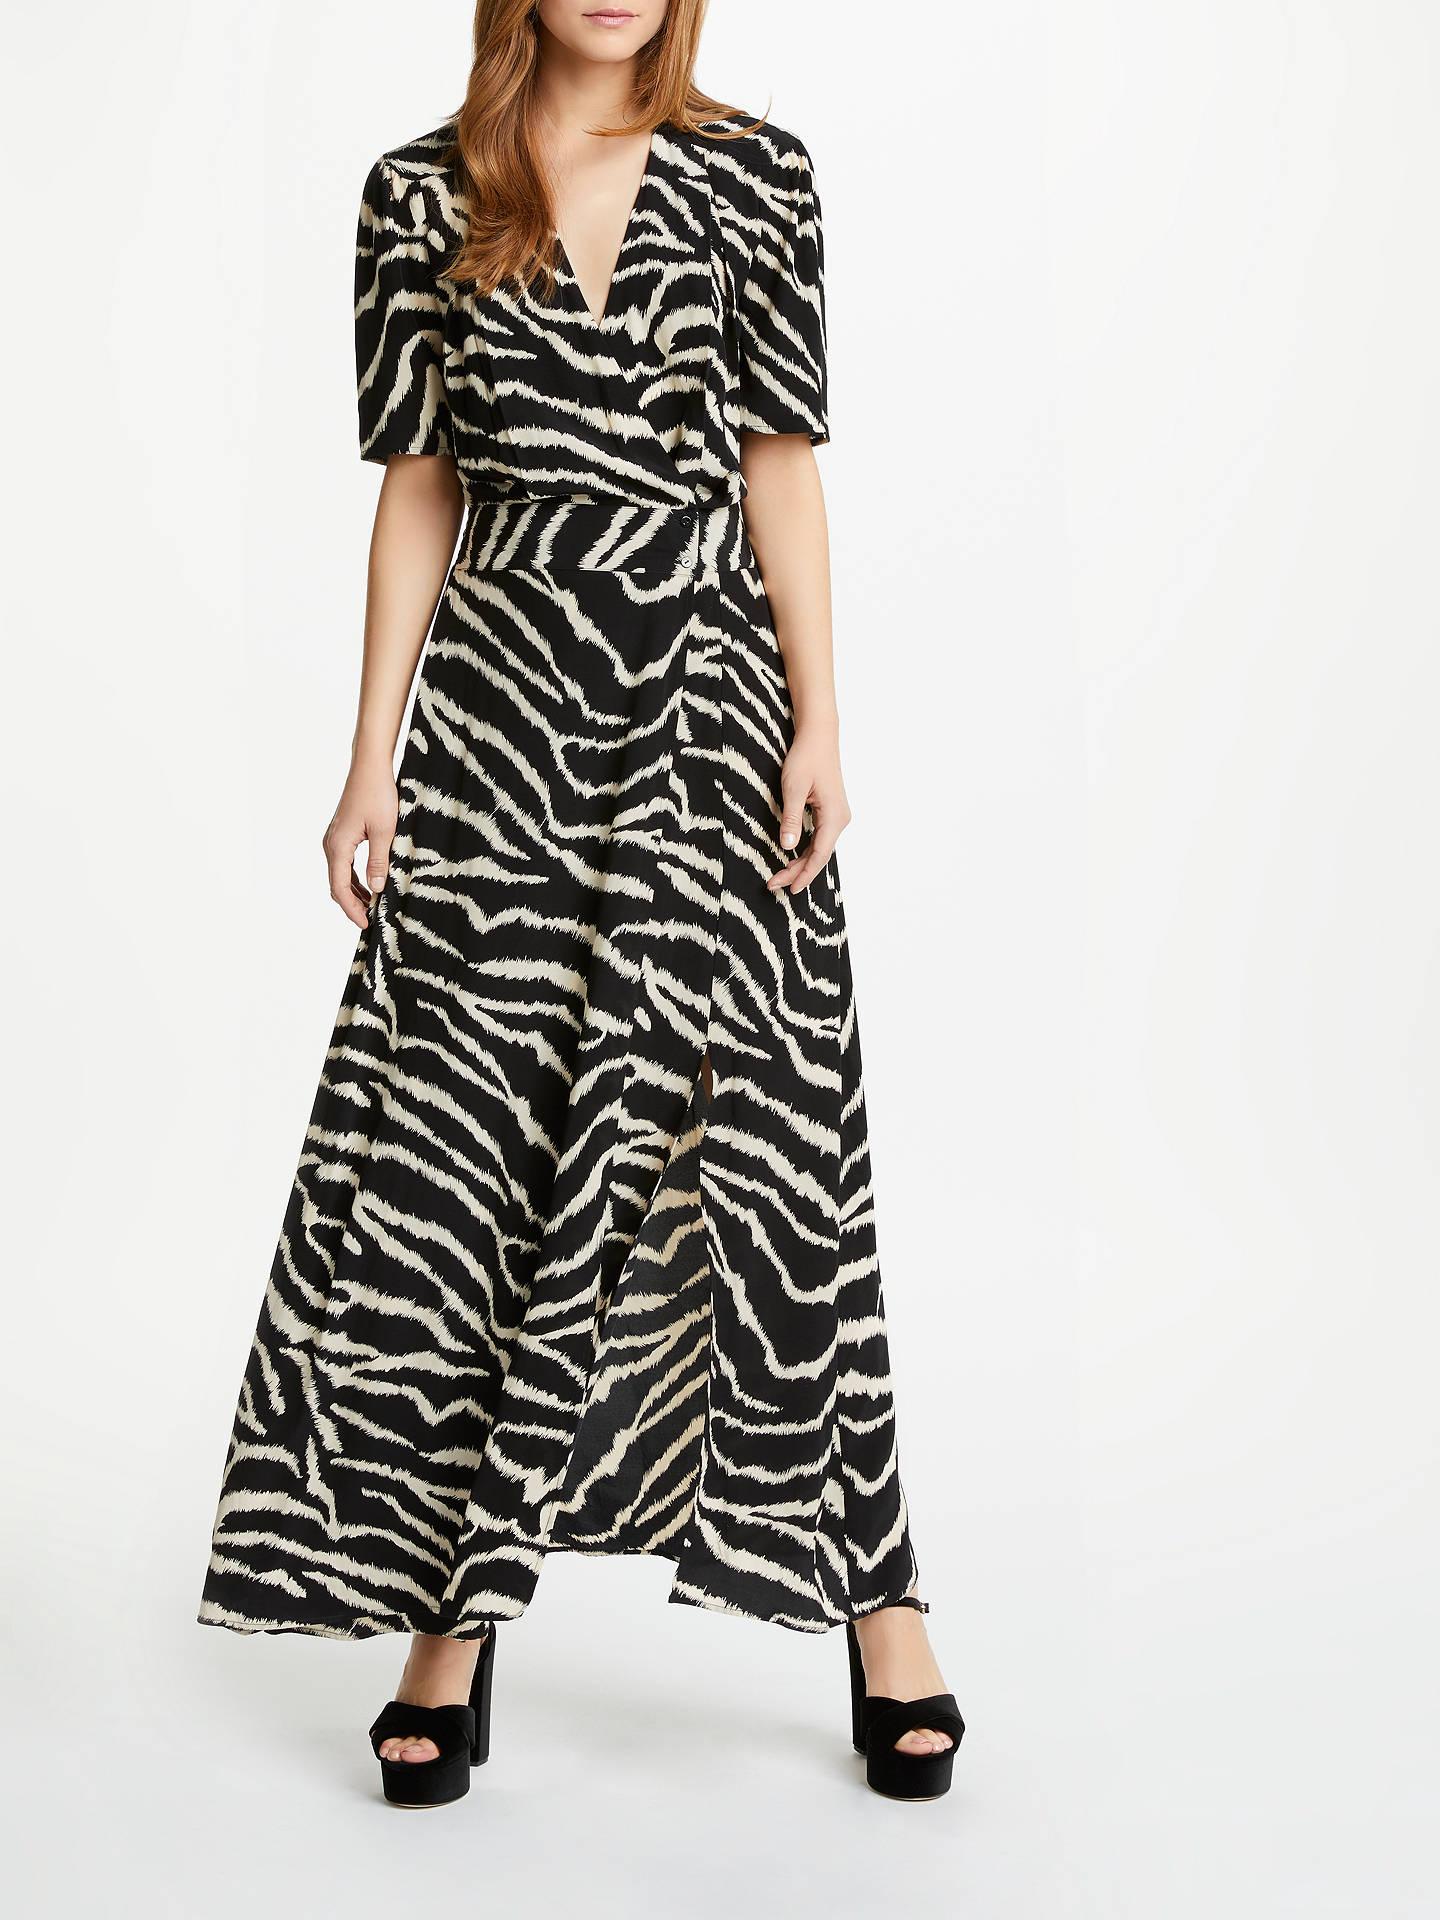 7e0b6edfdb Buy Somerset by Alice Temperley Zebra Print Wrap Maxi Dress